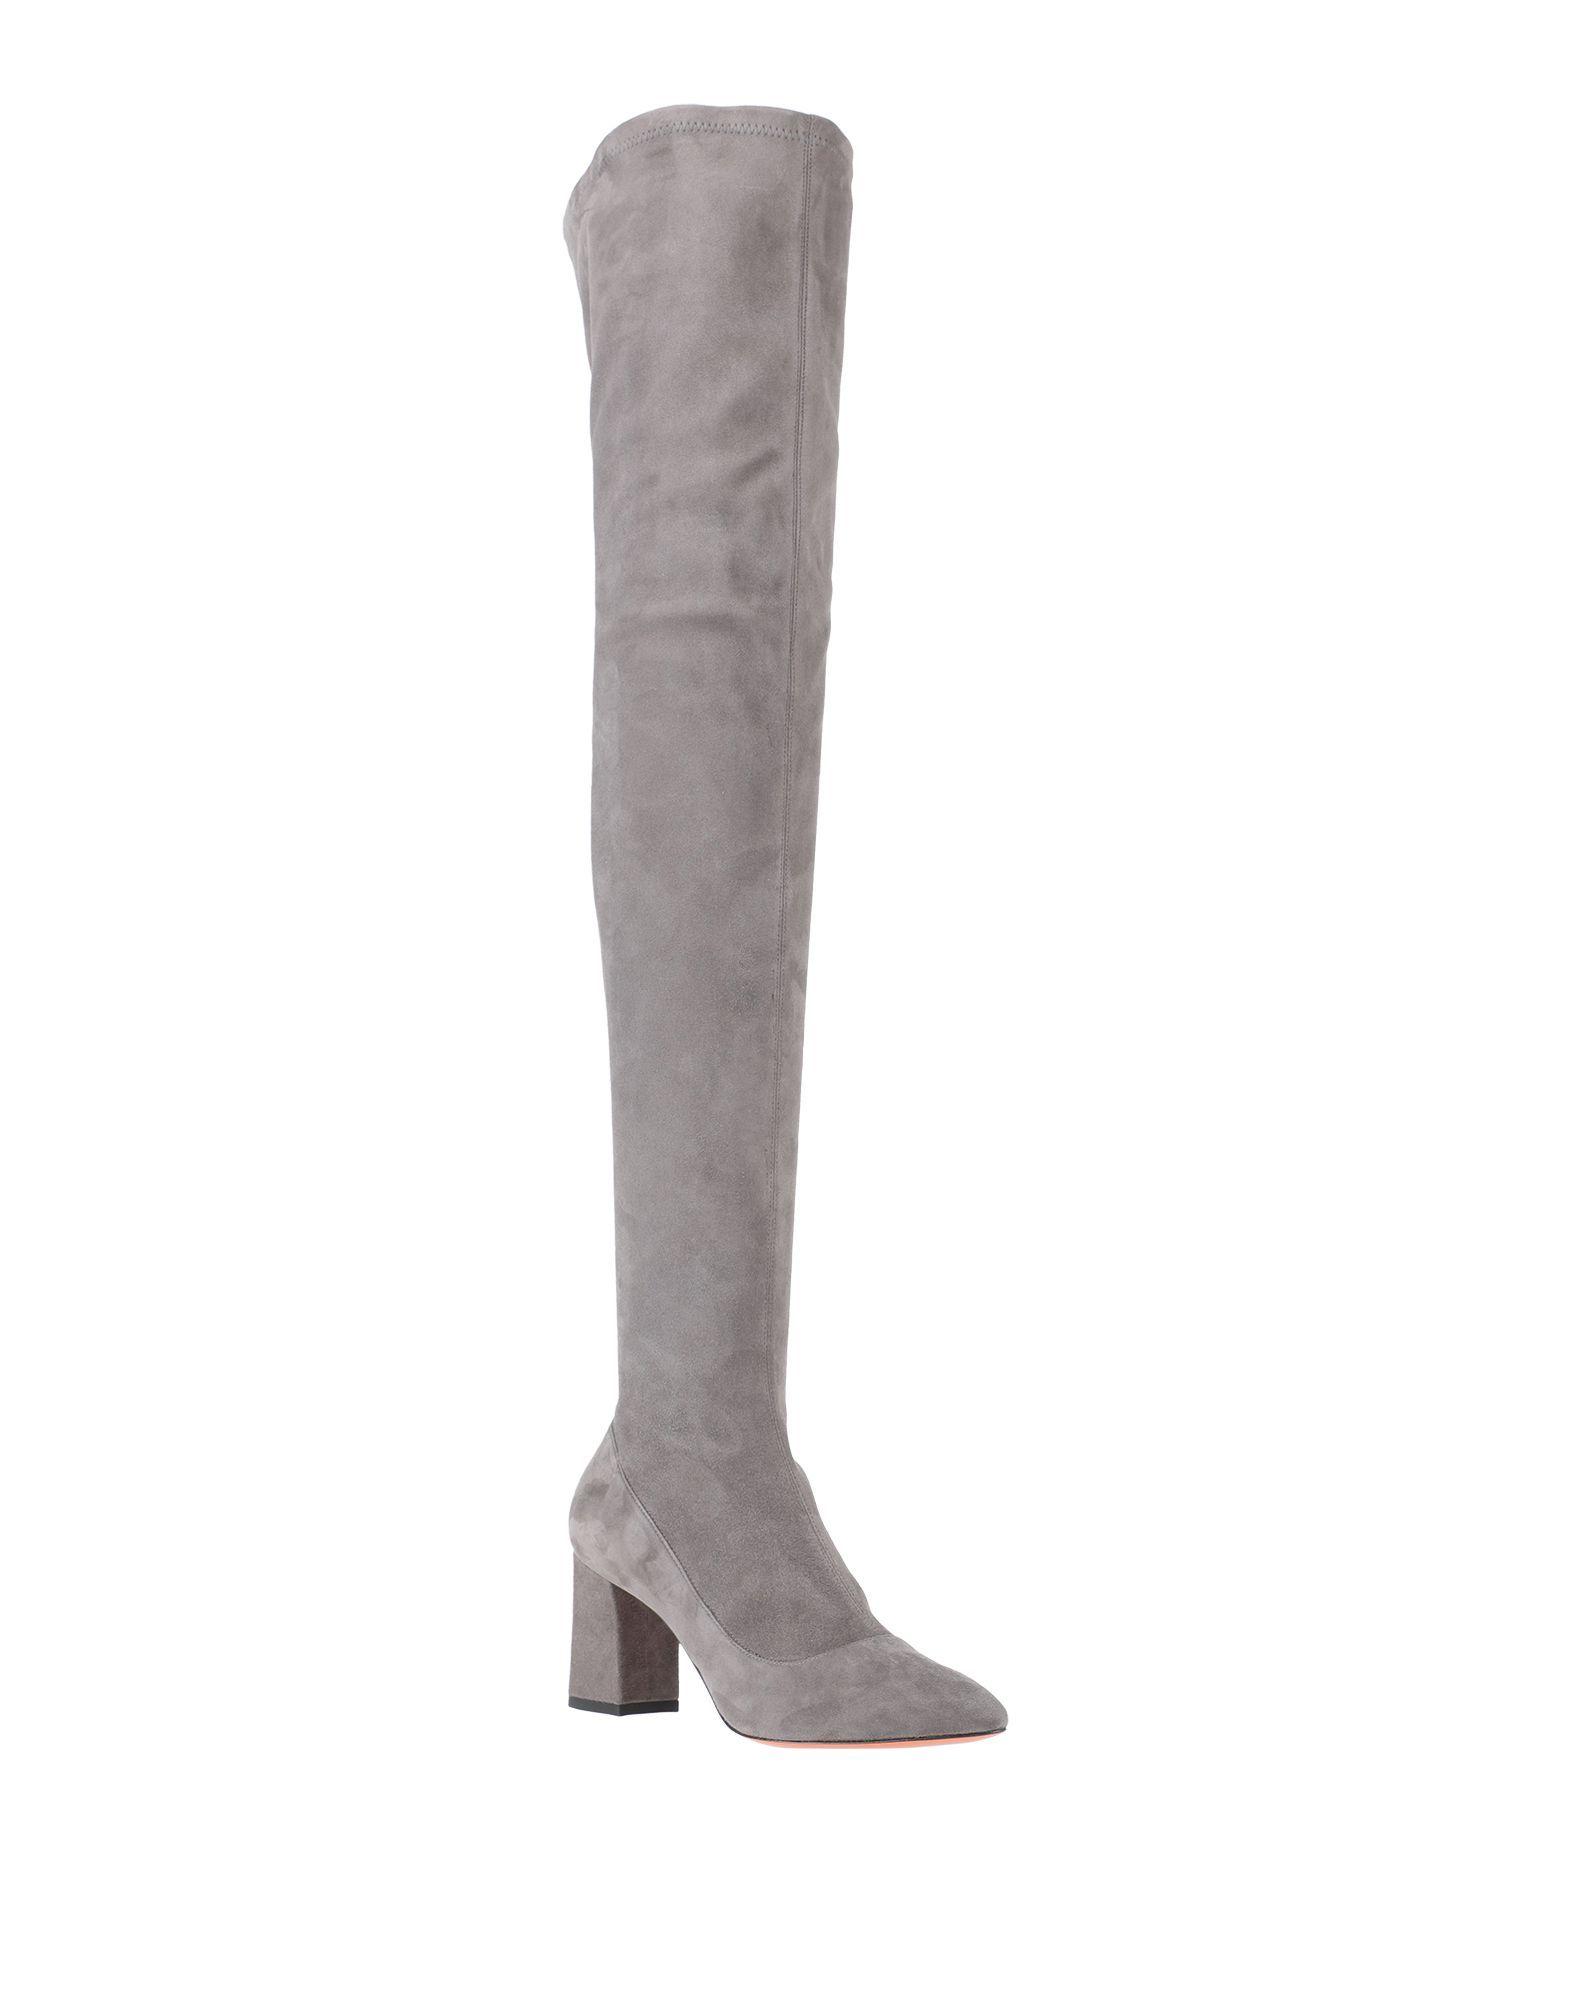 Santoni Women's Boots Leather